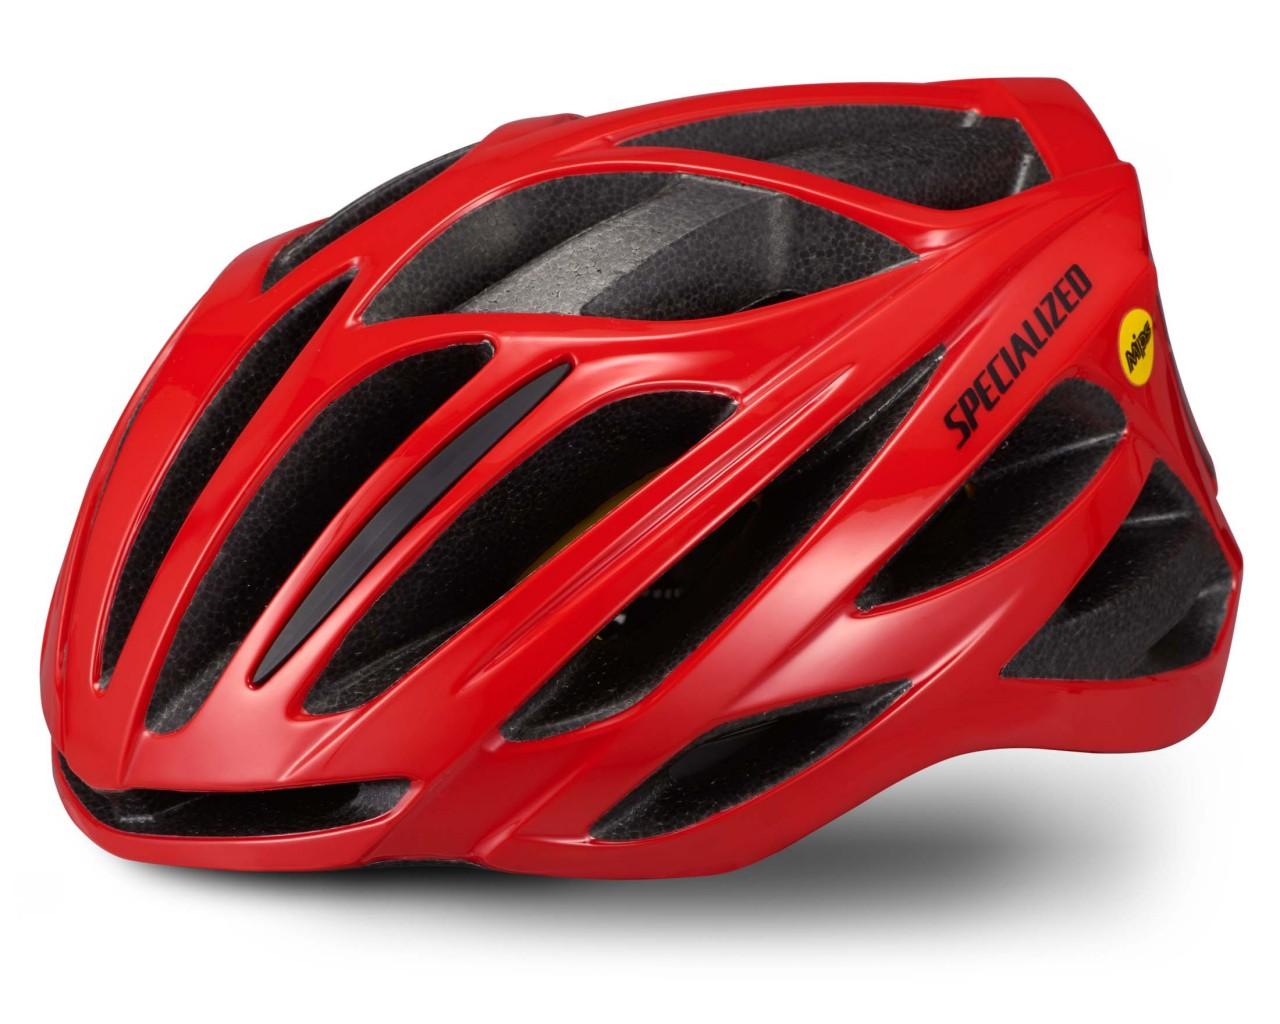 Specialized Echelon II Helmet MIPS (ANGI compatible)   flo red-black reflective